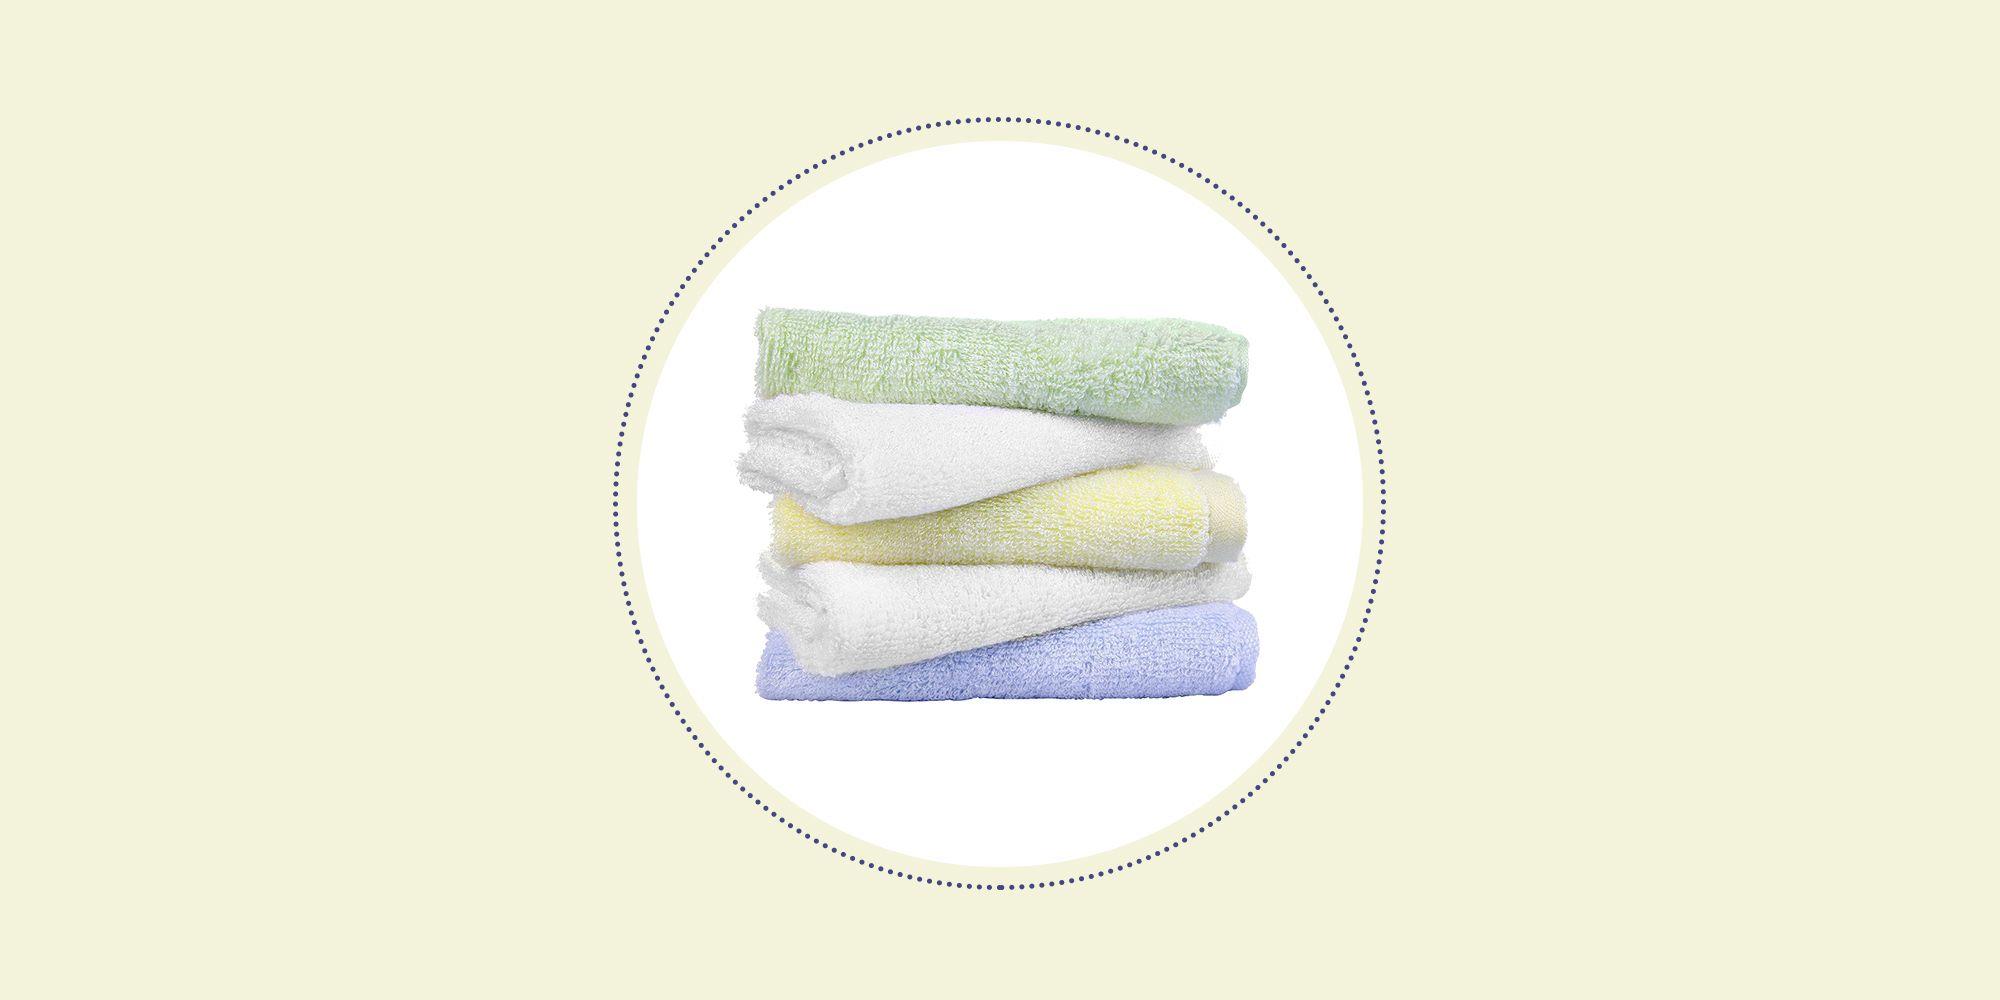 8 eco-friendly wet wipe alternatives